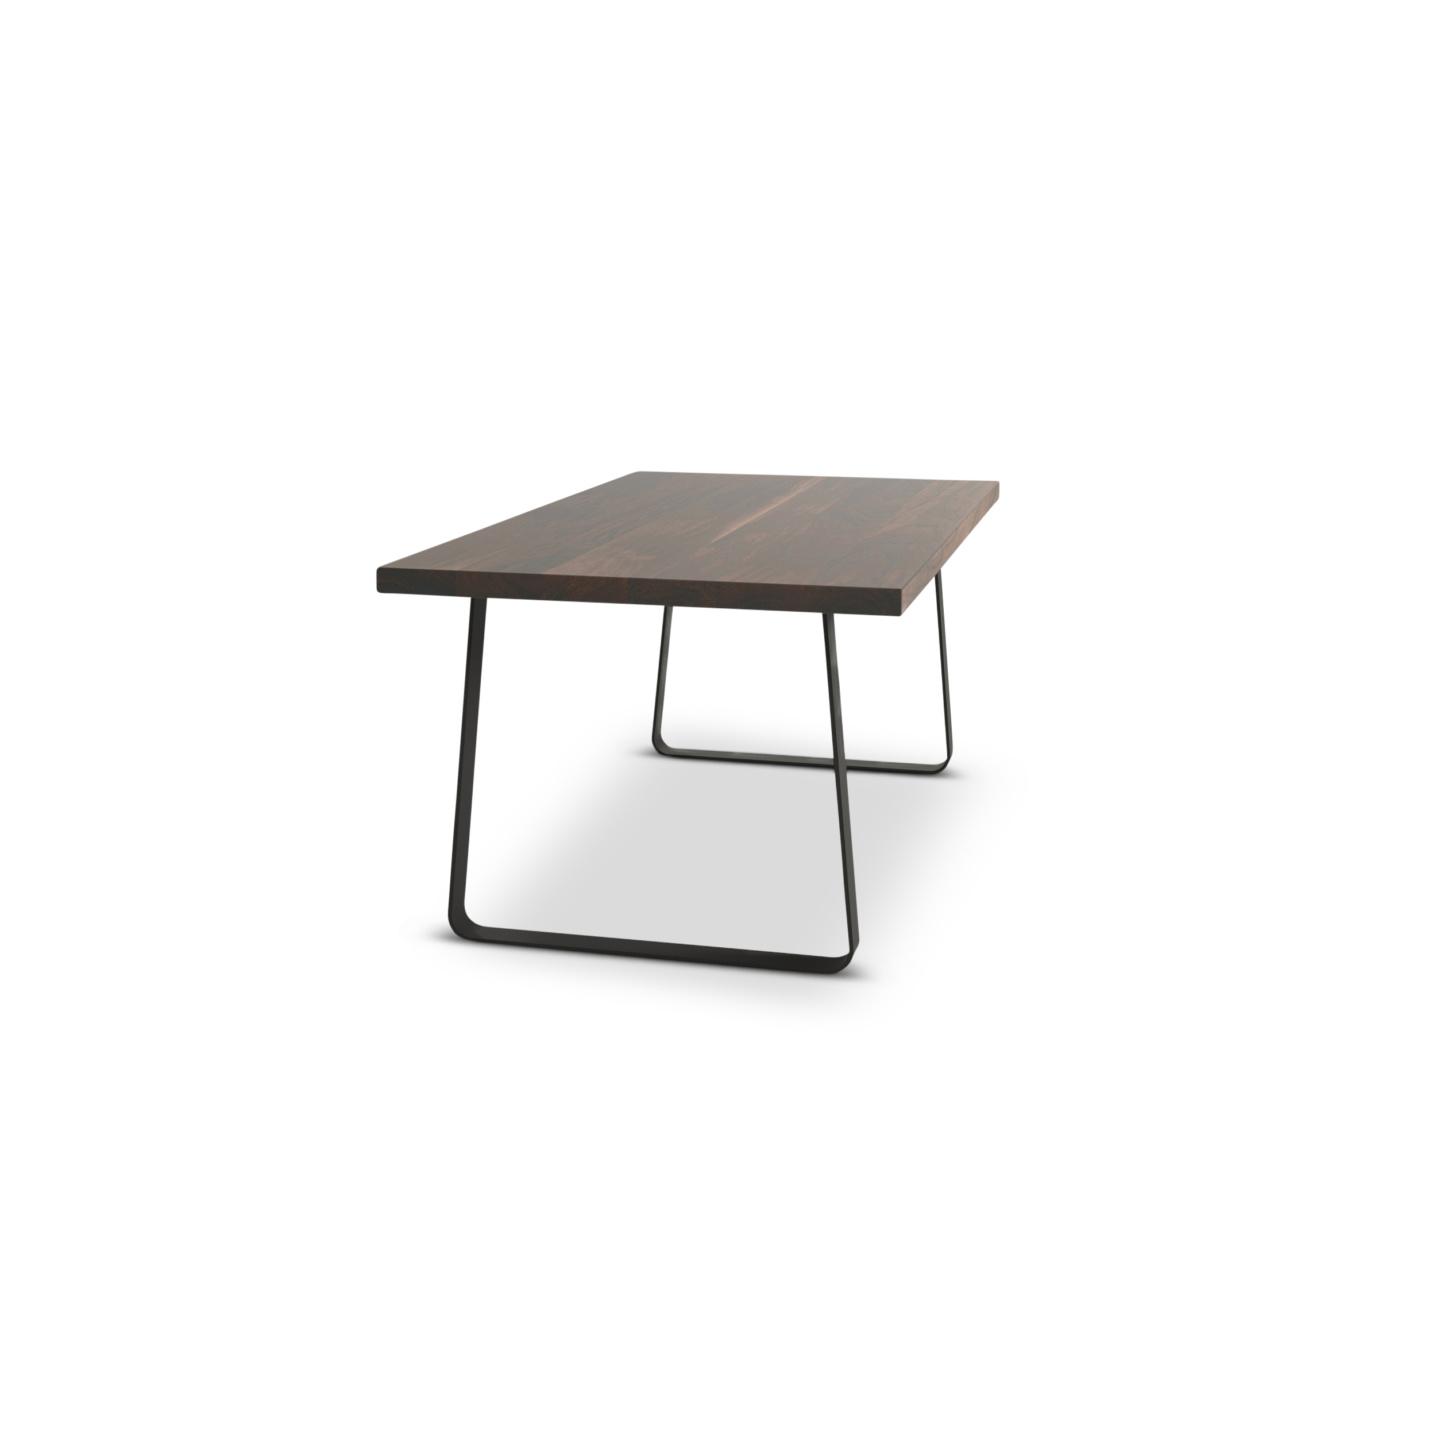 Custom table with walnut wood top